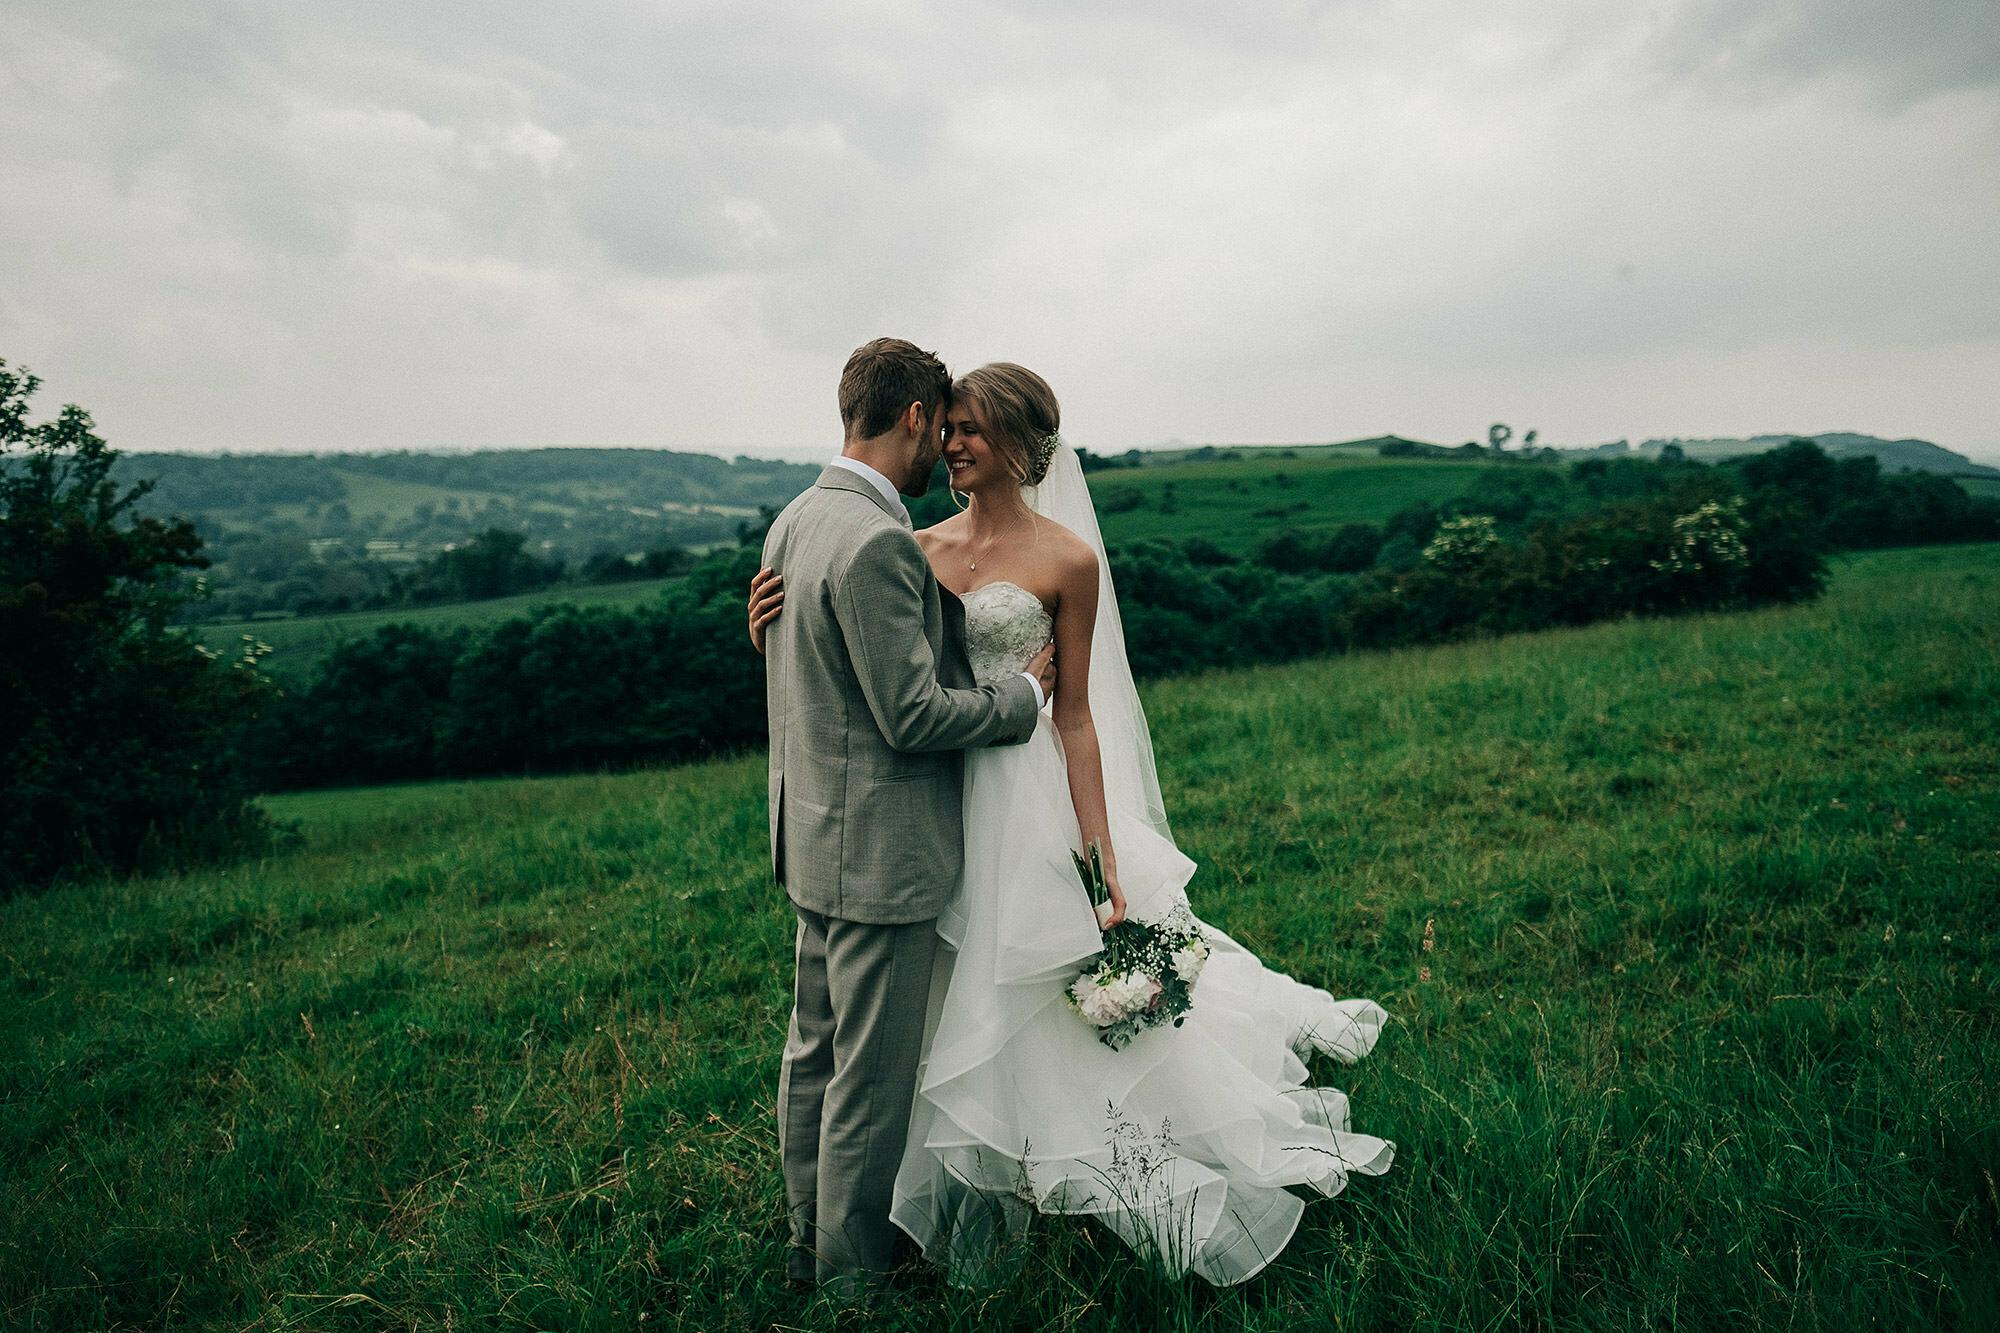 taisy-matthew-wed-2016-0357